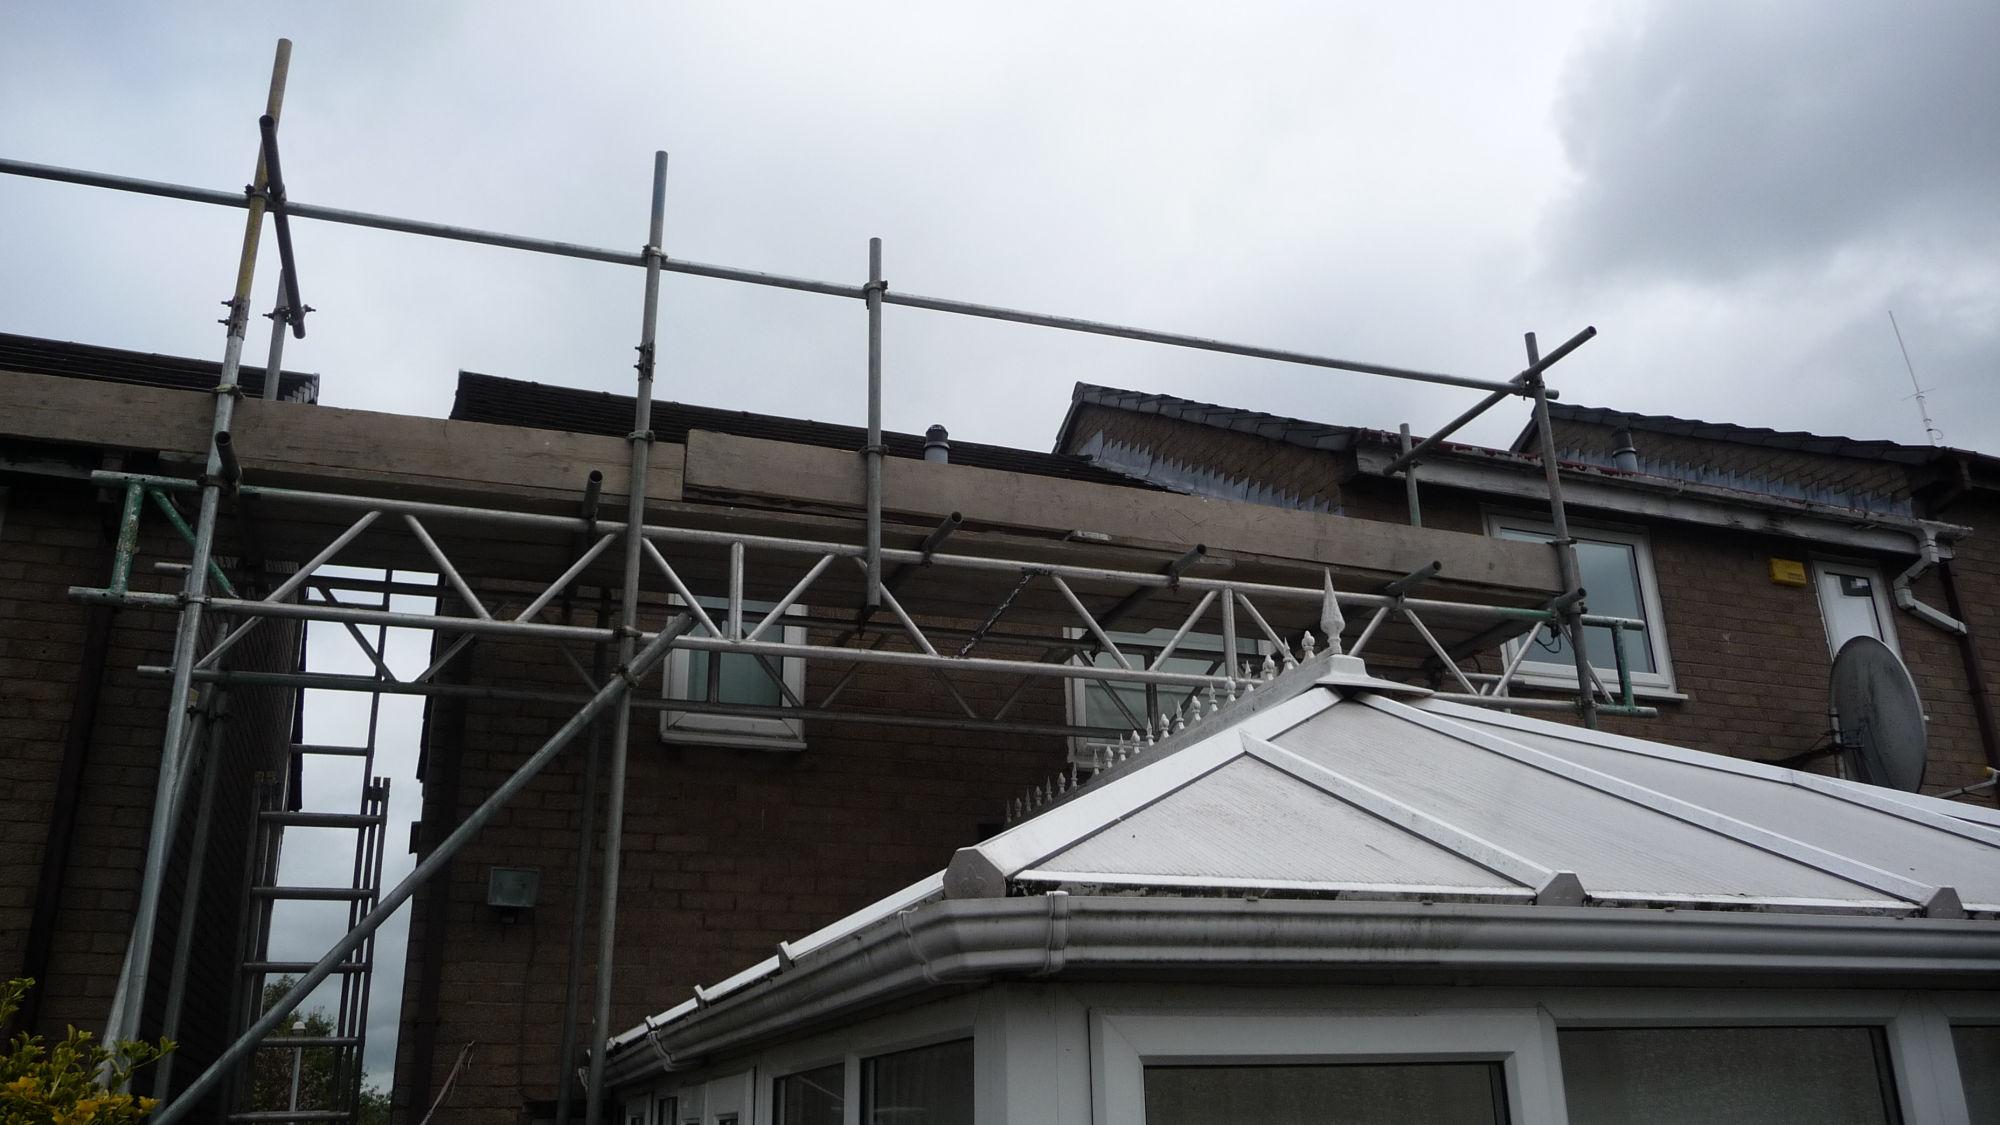 Scaffolding for roof repair in Burnley